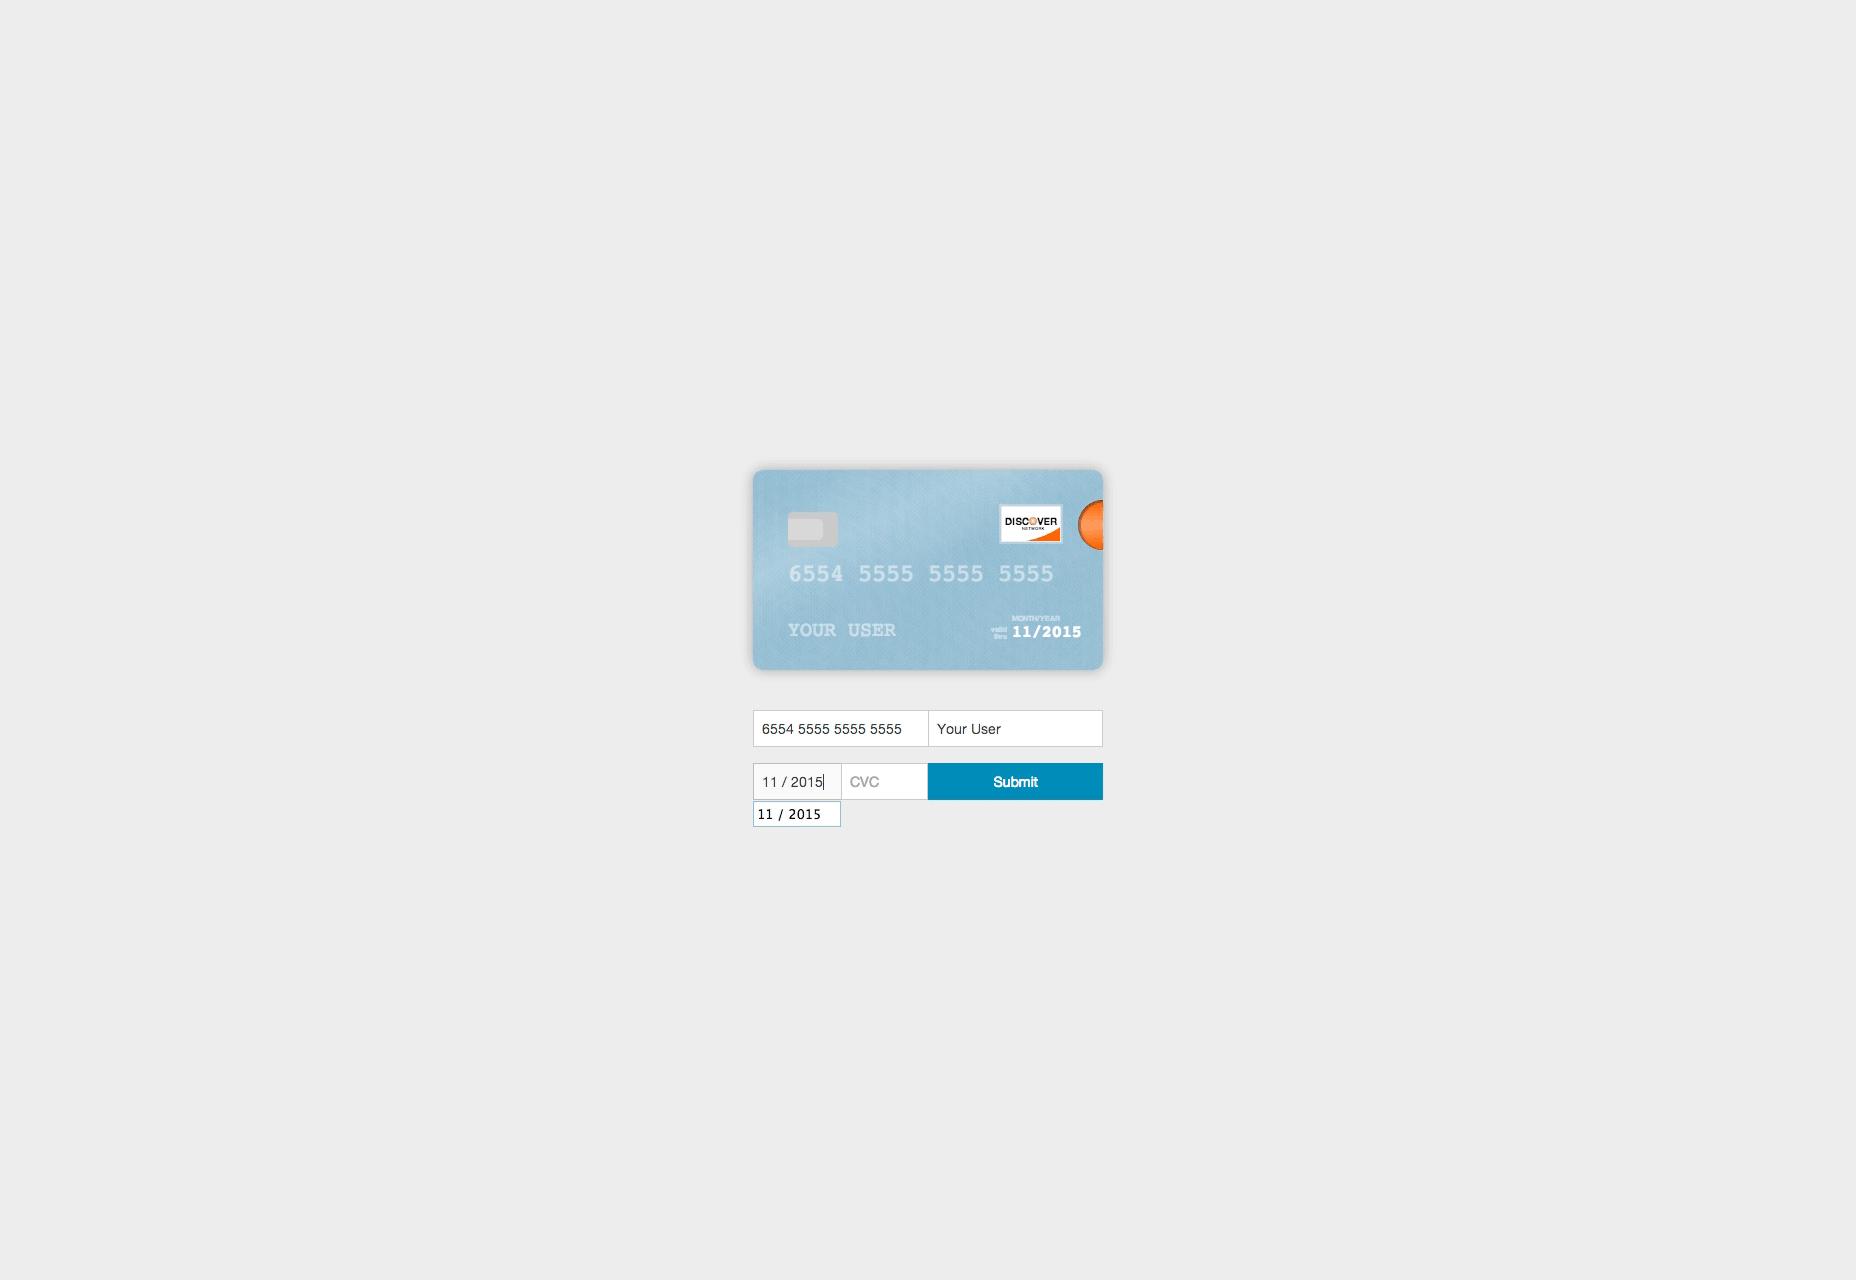 Tarjeta: información de la tarjeta de crédito JavaScript Visualizer